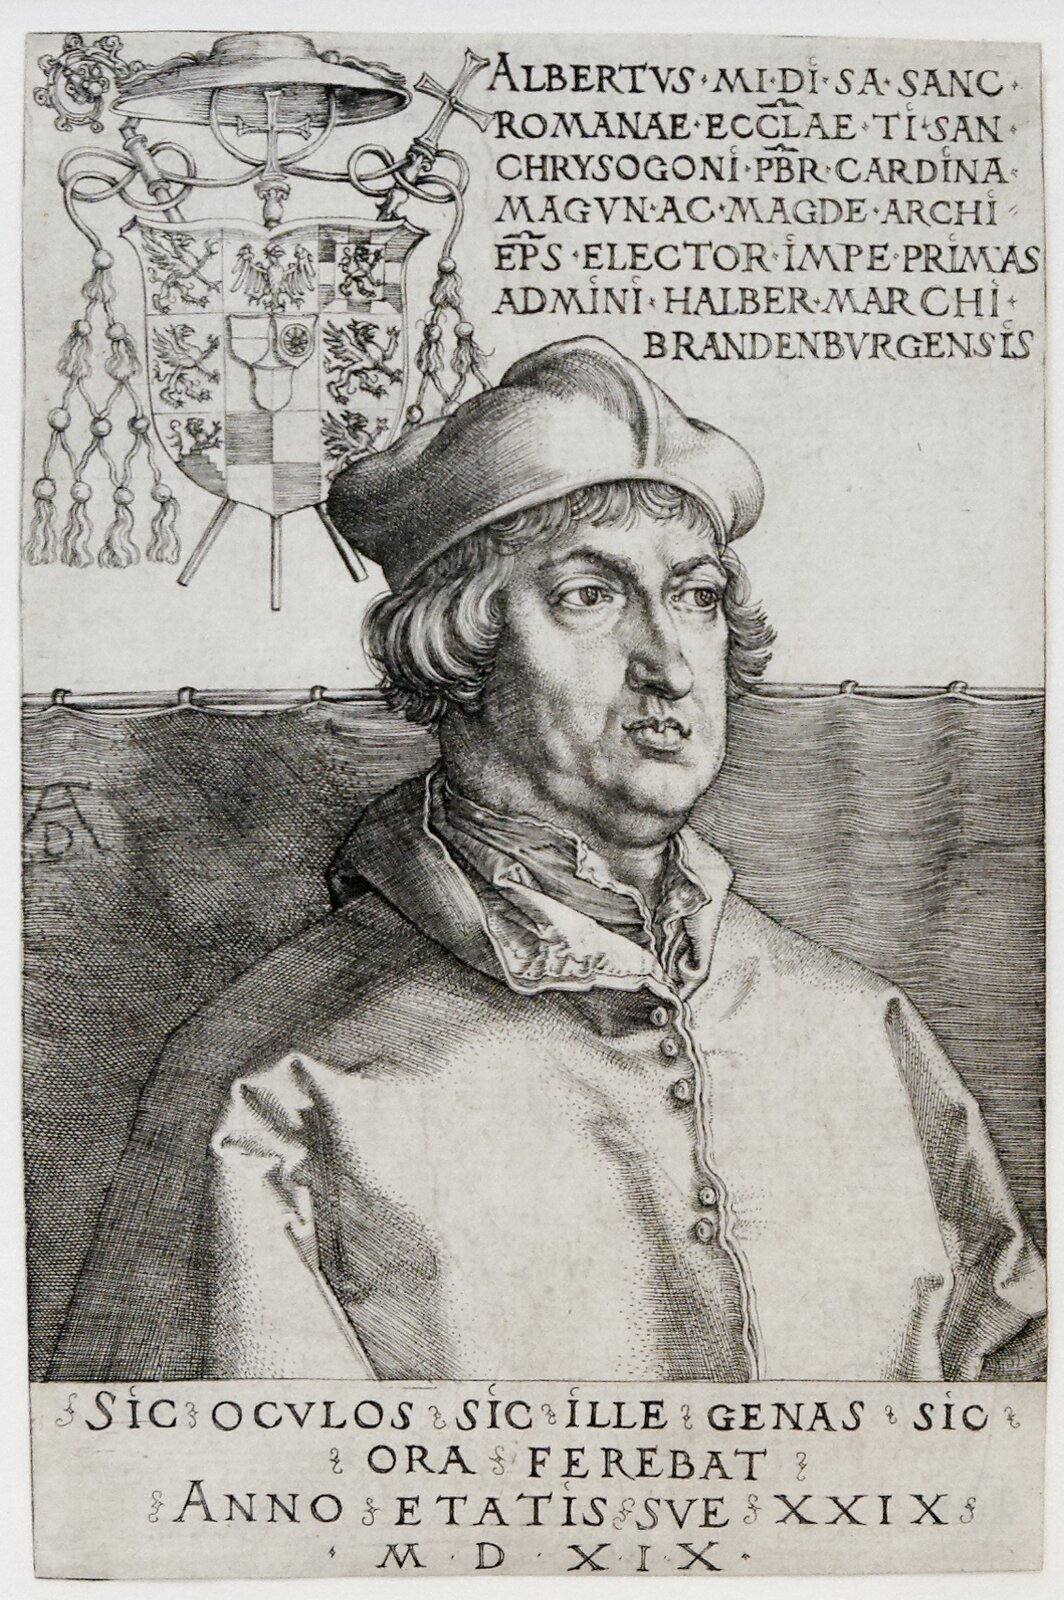 Albrecht Hohenzollern – arcybiskup Magdeburga iMoguncji Źródło: Albrecht Dürer, Albrecht Hohenzollern – arcybiskup Magdeburga iMoguncji, 1519, rycina, Victoria and Albert Museum, domena publiczna.